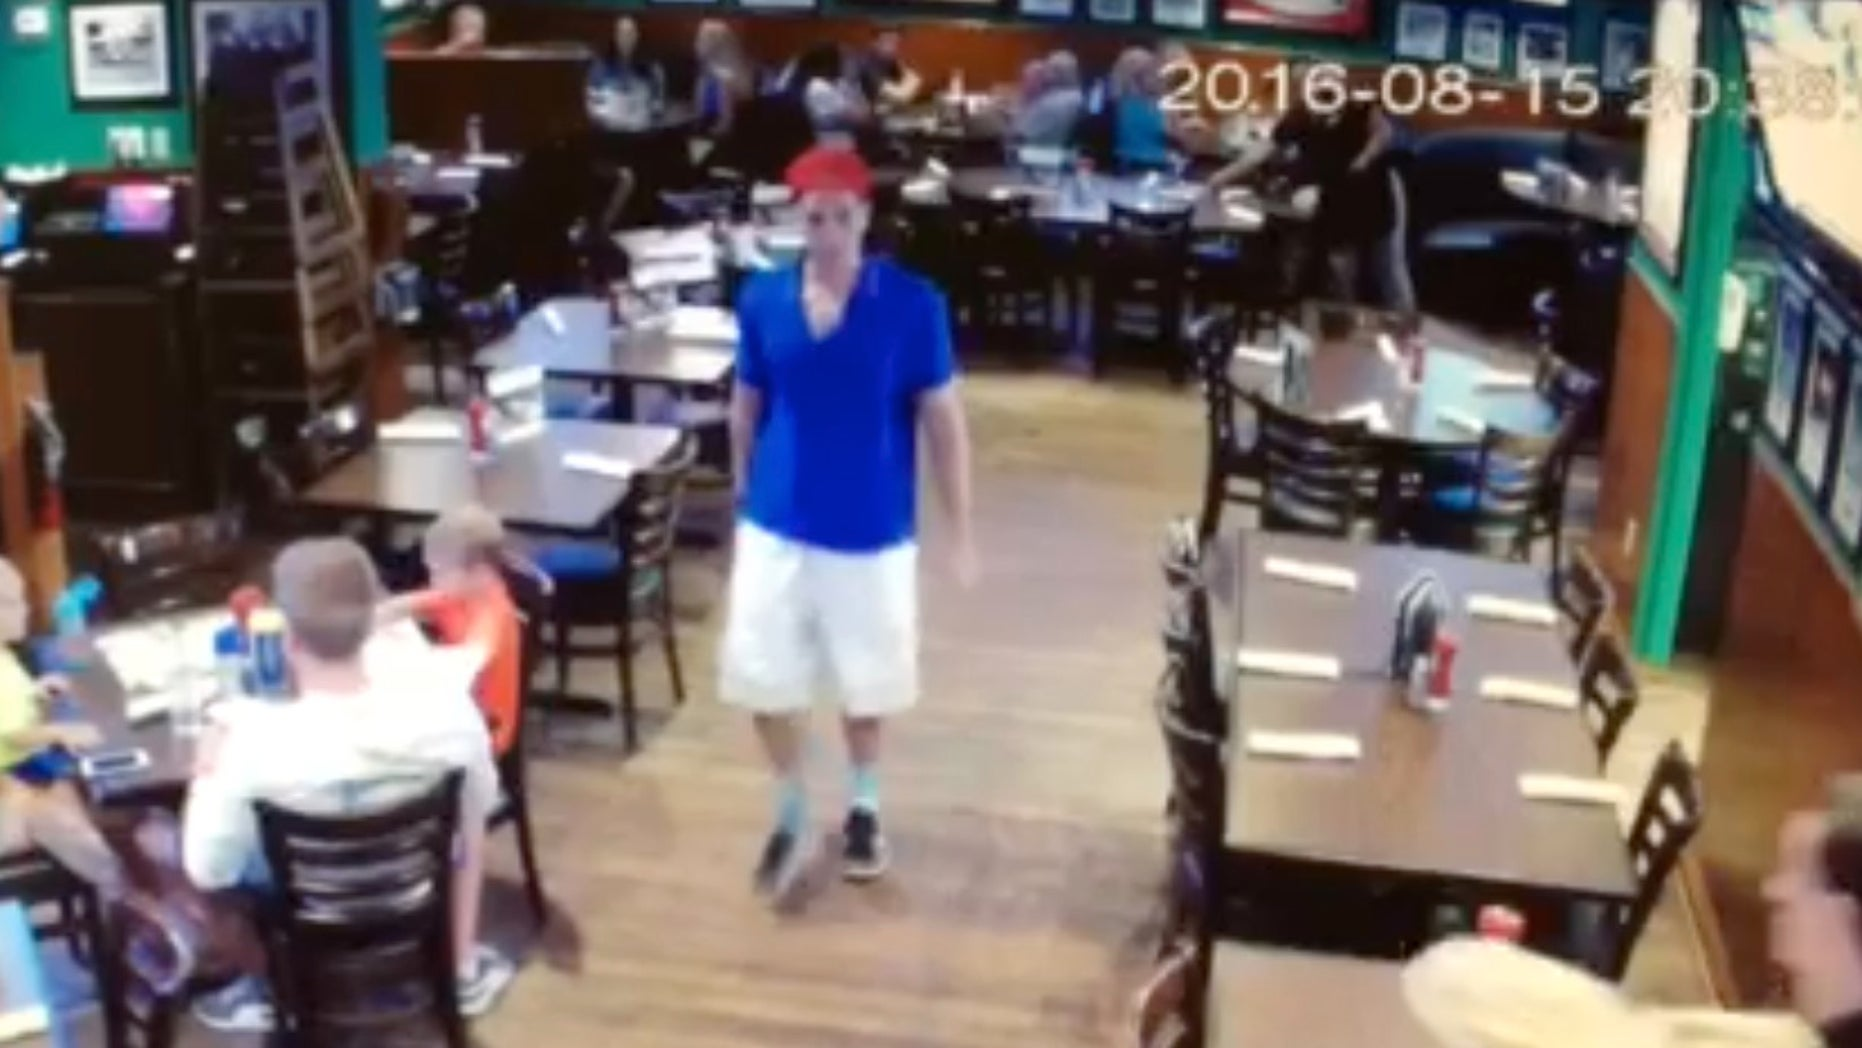 Austin Harrouff leaving a restaurant in Jupiter, Florida before the alleged attack.